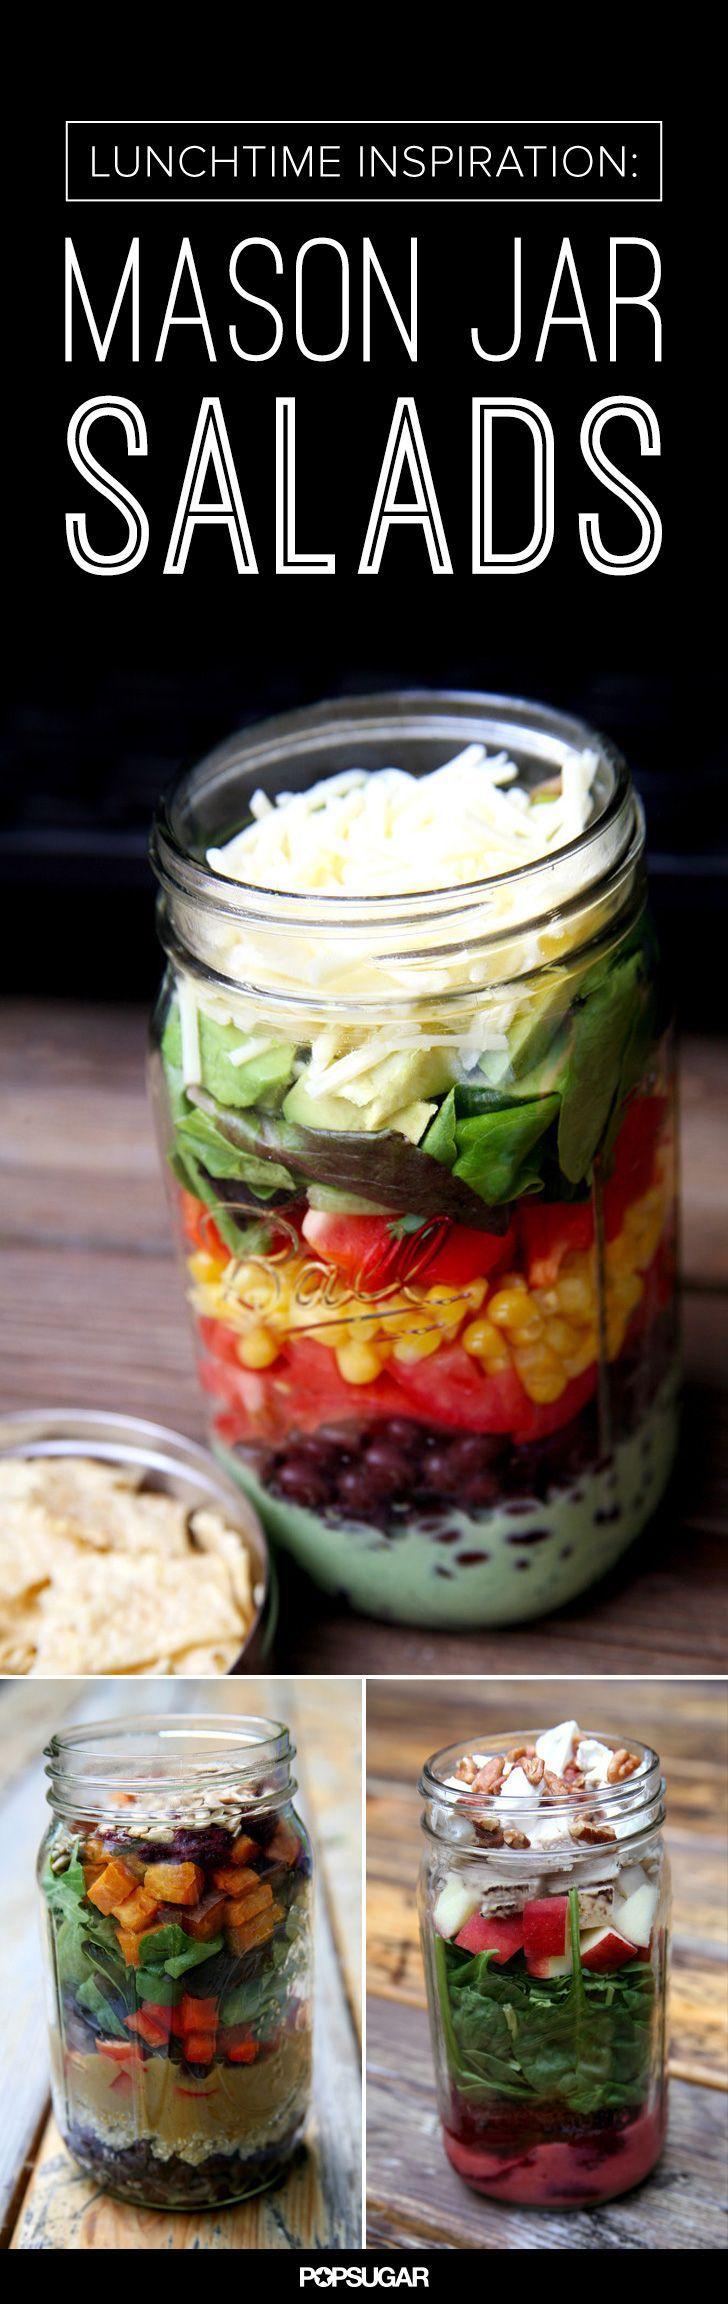 Inspiration for mason jar salads. Love adding quinoa and roasted veggies.